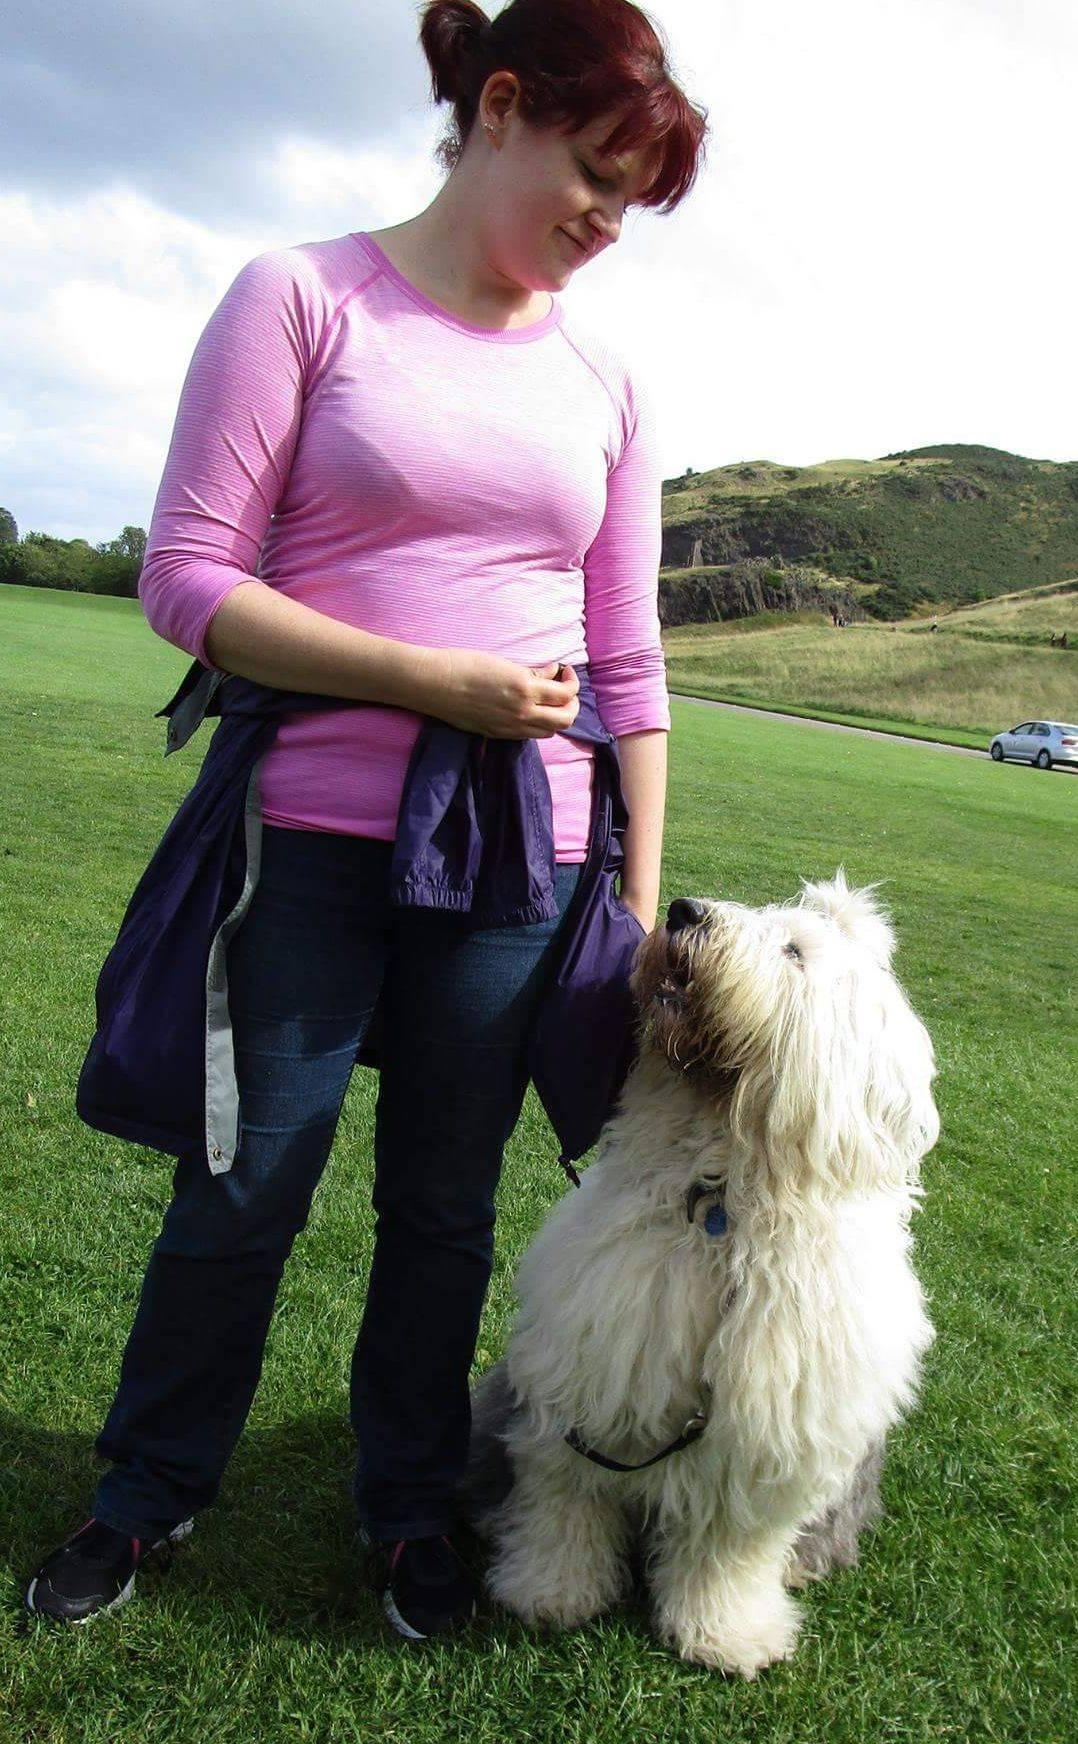 Dog walking, Edinburgh, EH6, EH7, EH8, EH15, Leith, Trinity, Dunningston, portobello, craigentinny, newhaven, bonnington, Dog, holistic, puppy, pet, training, sitting, walking,